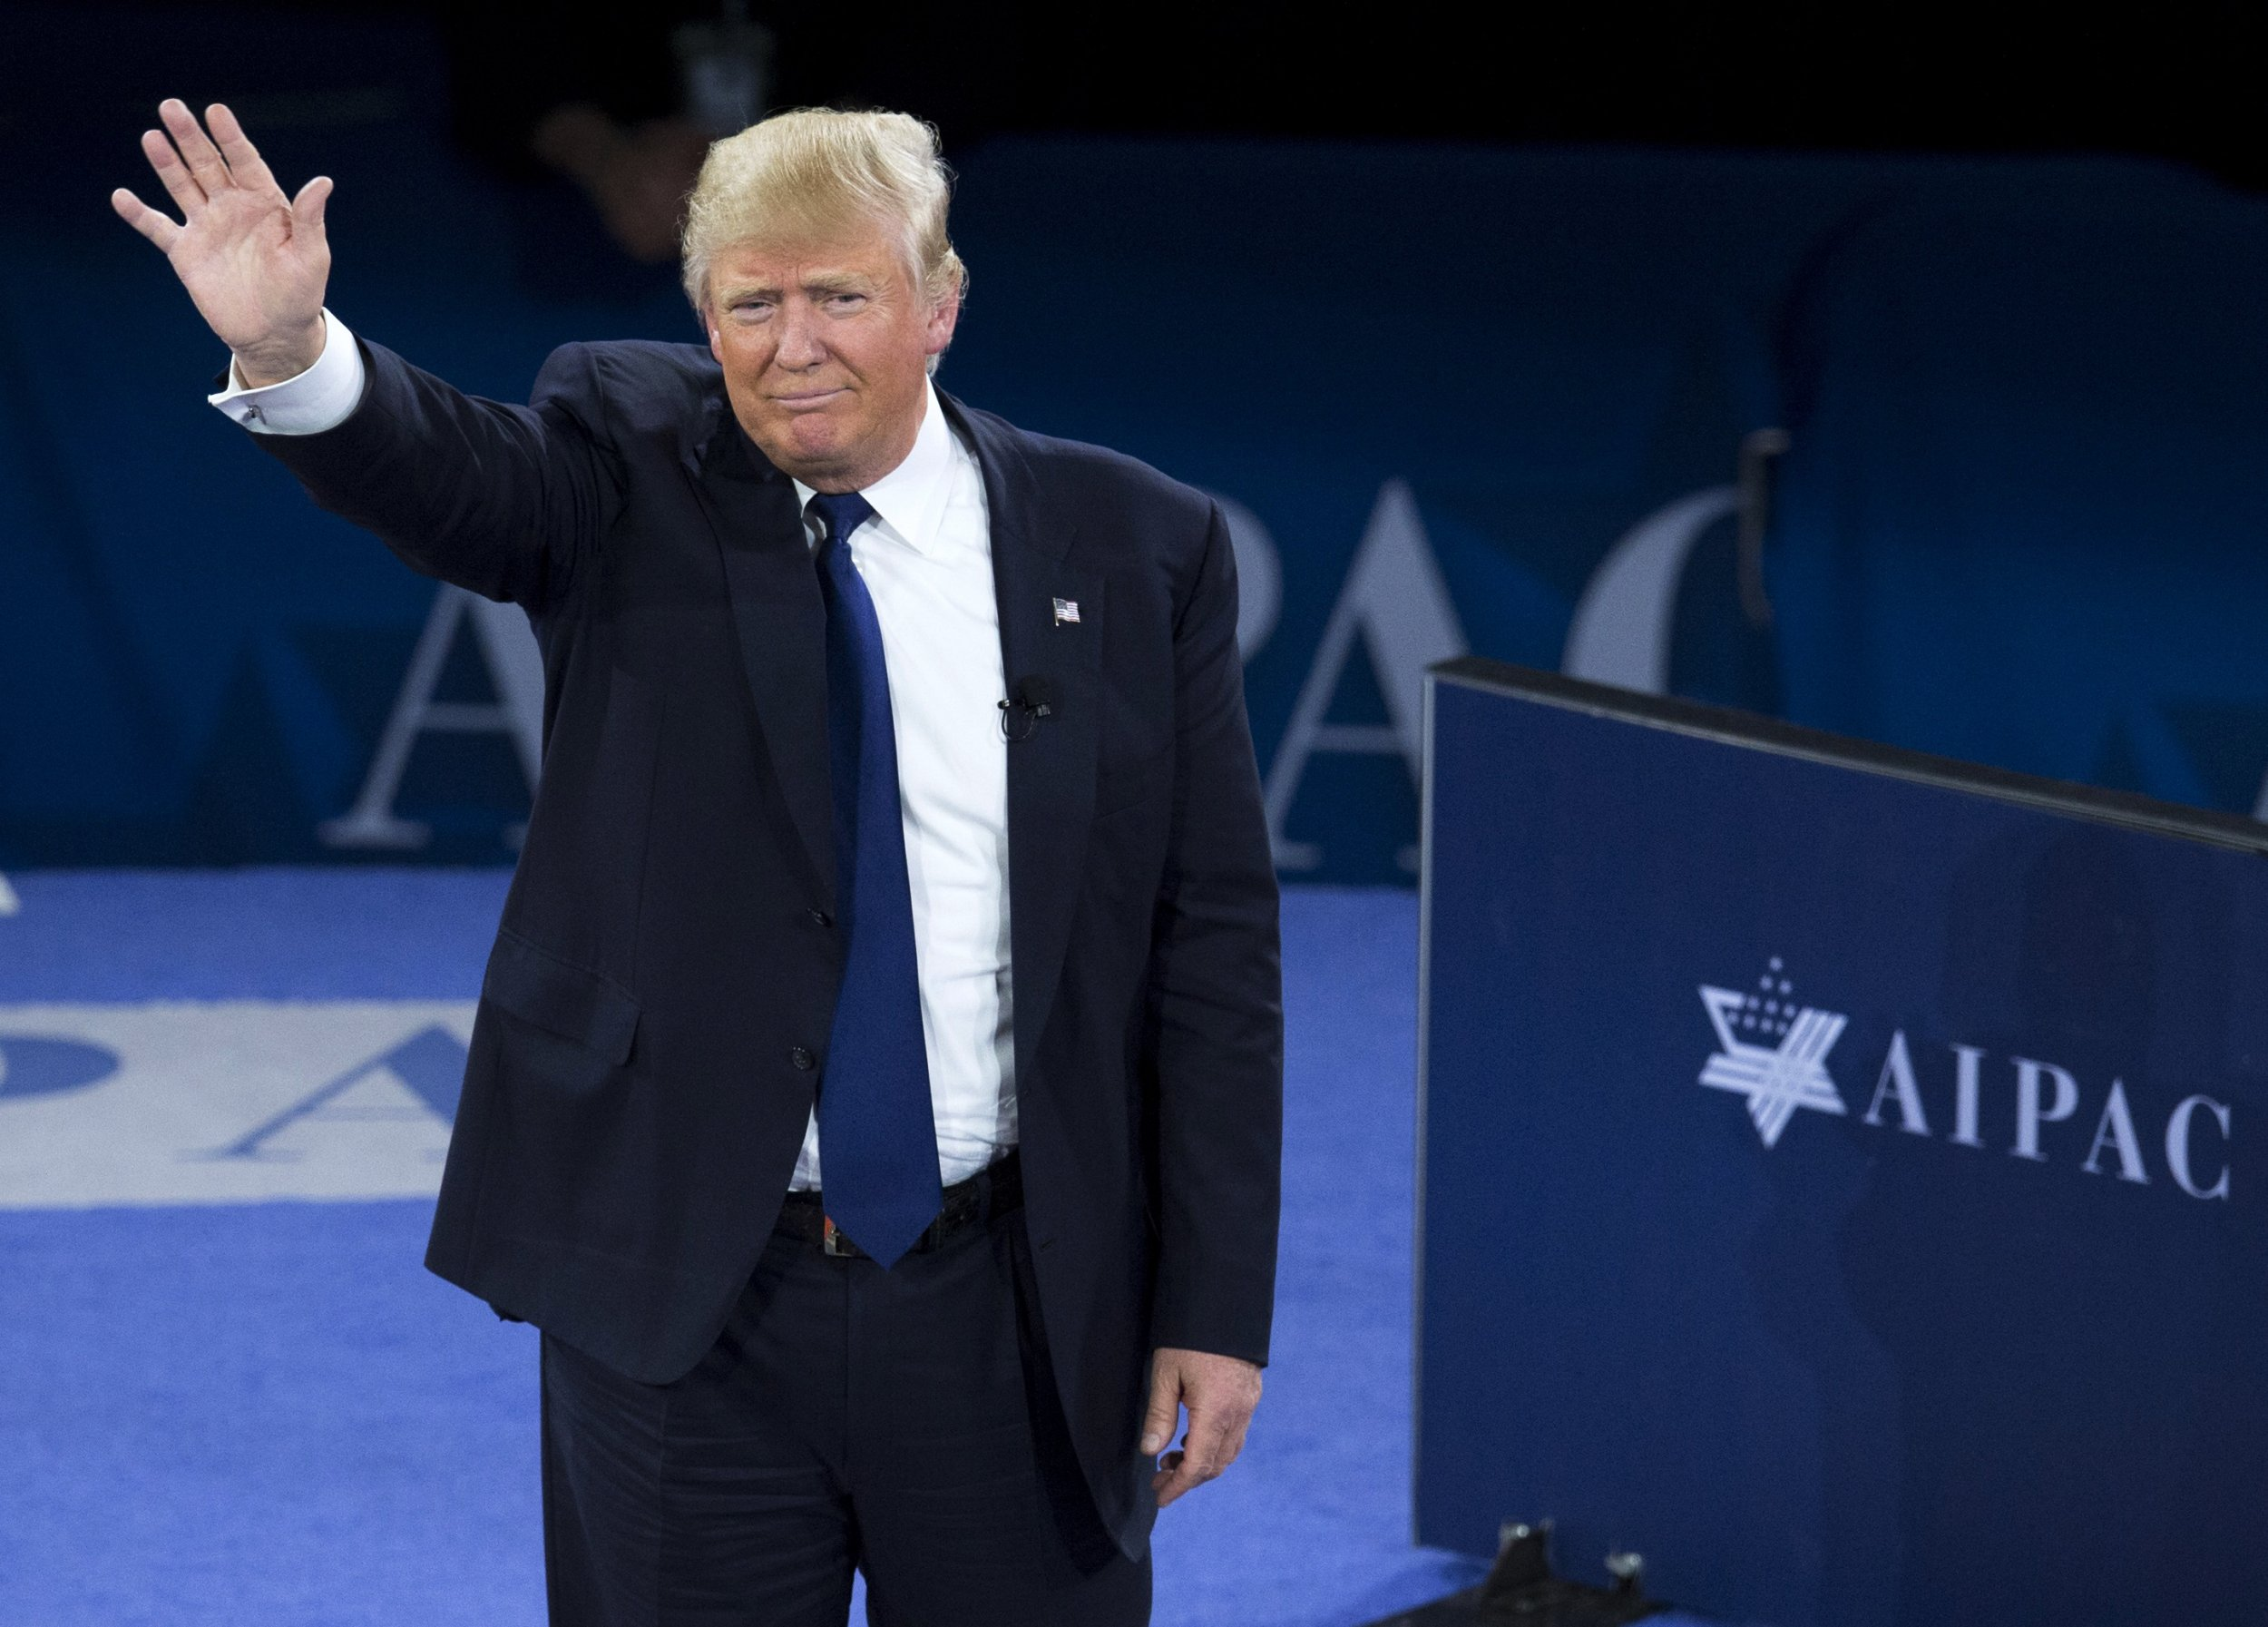 Why The Israeli Hard Right Loves Donald Trump